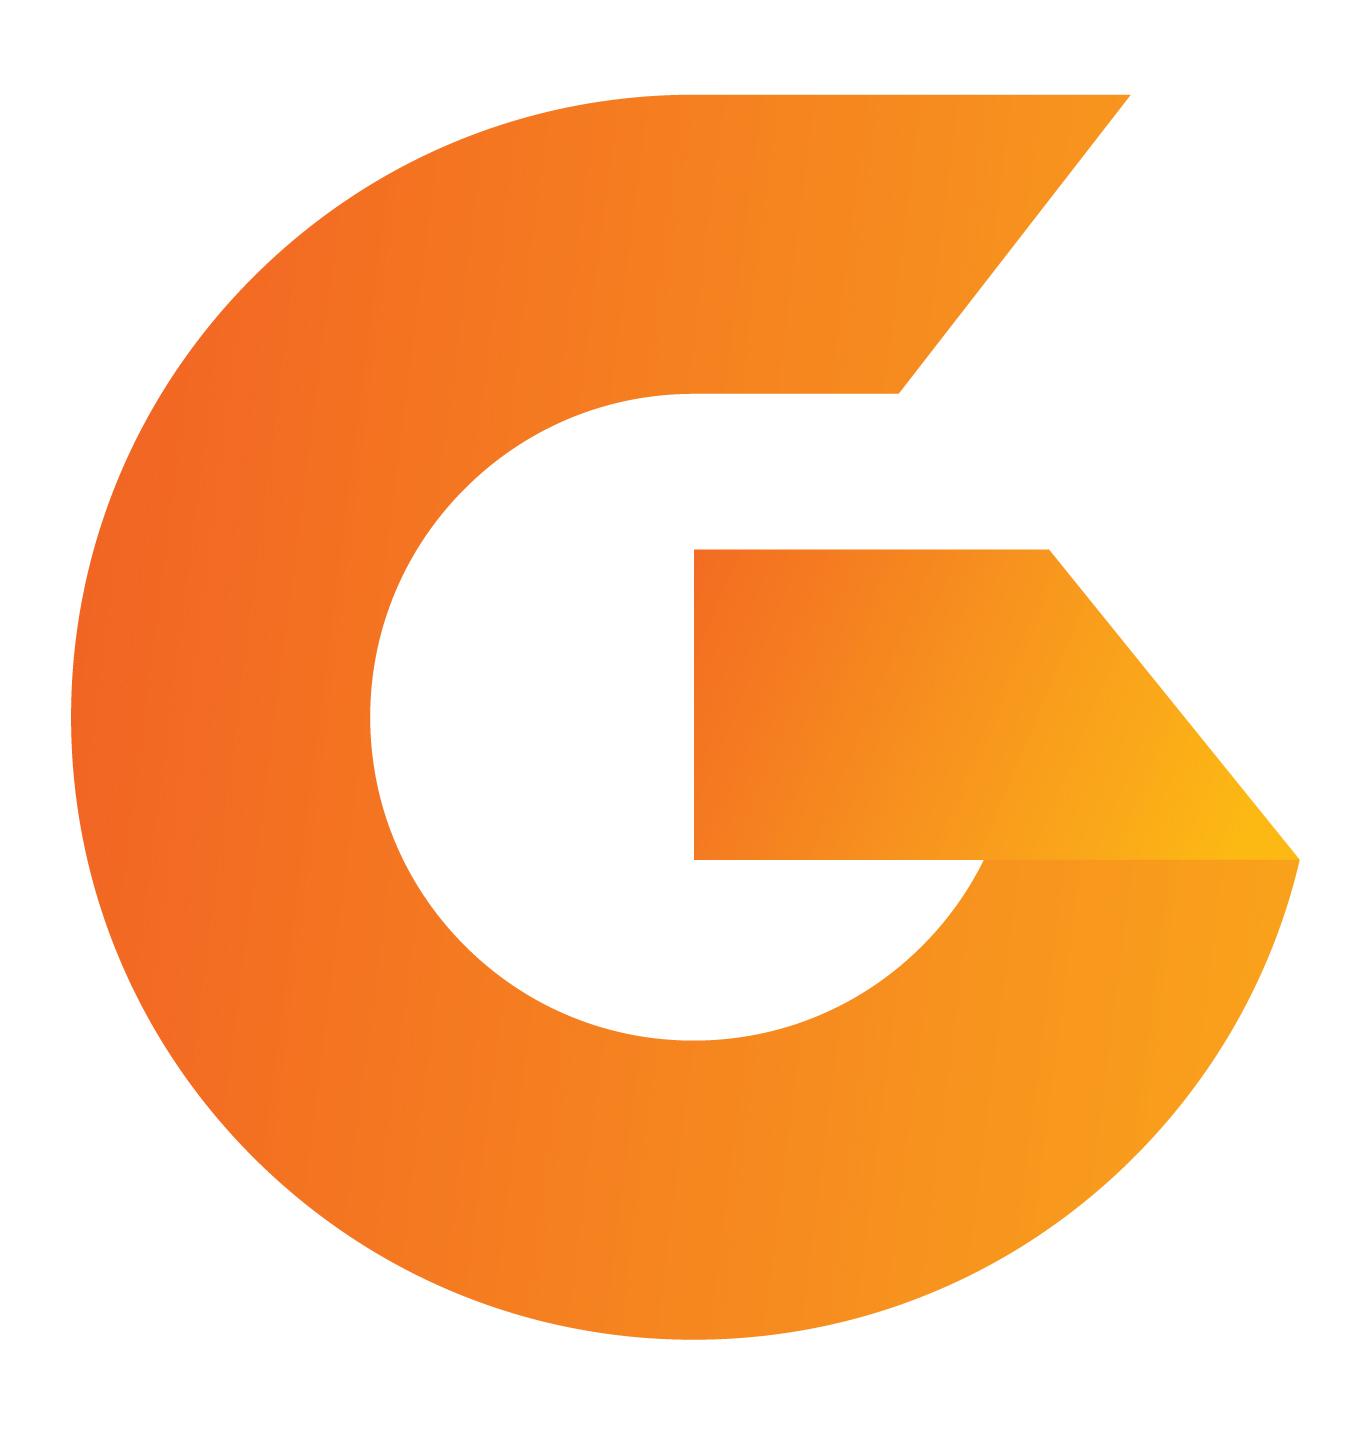 orange_g.jpg